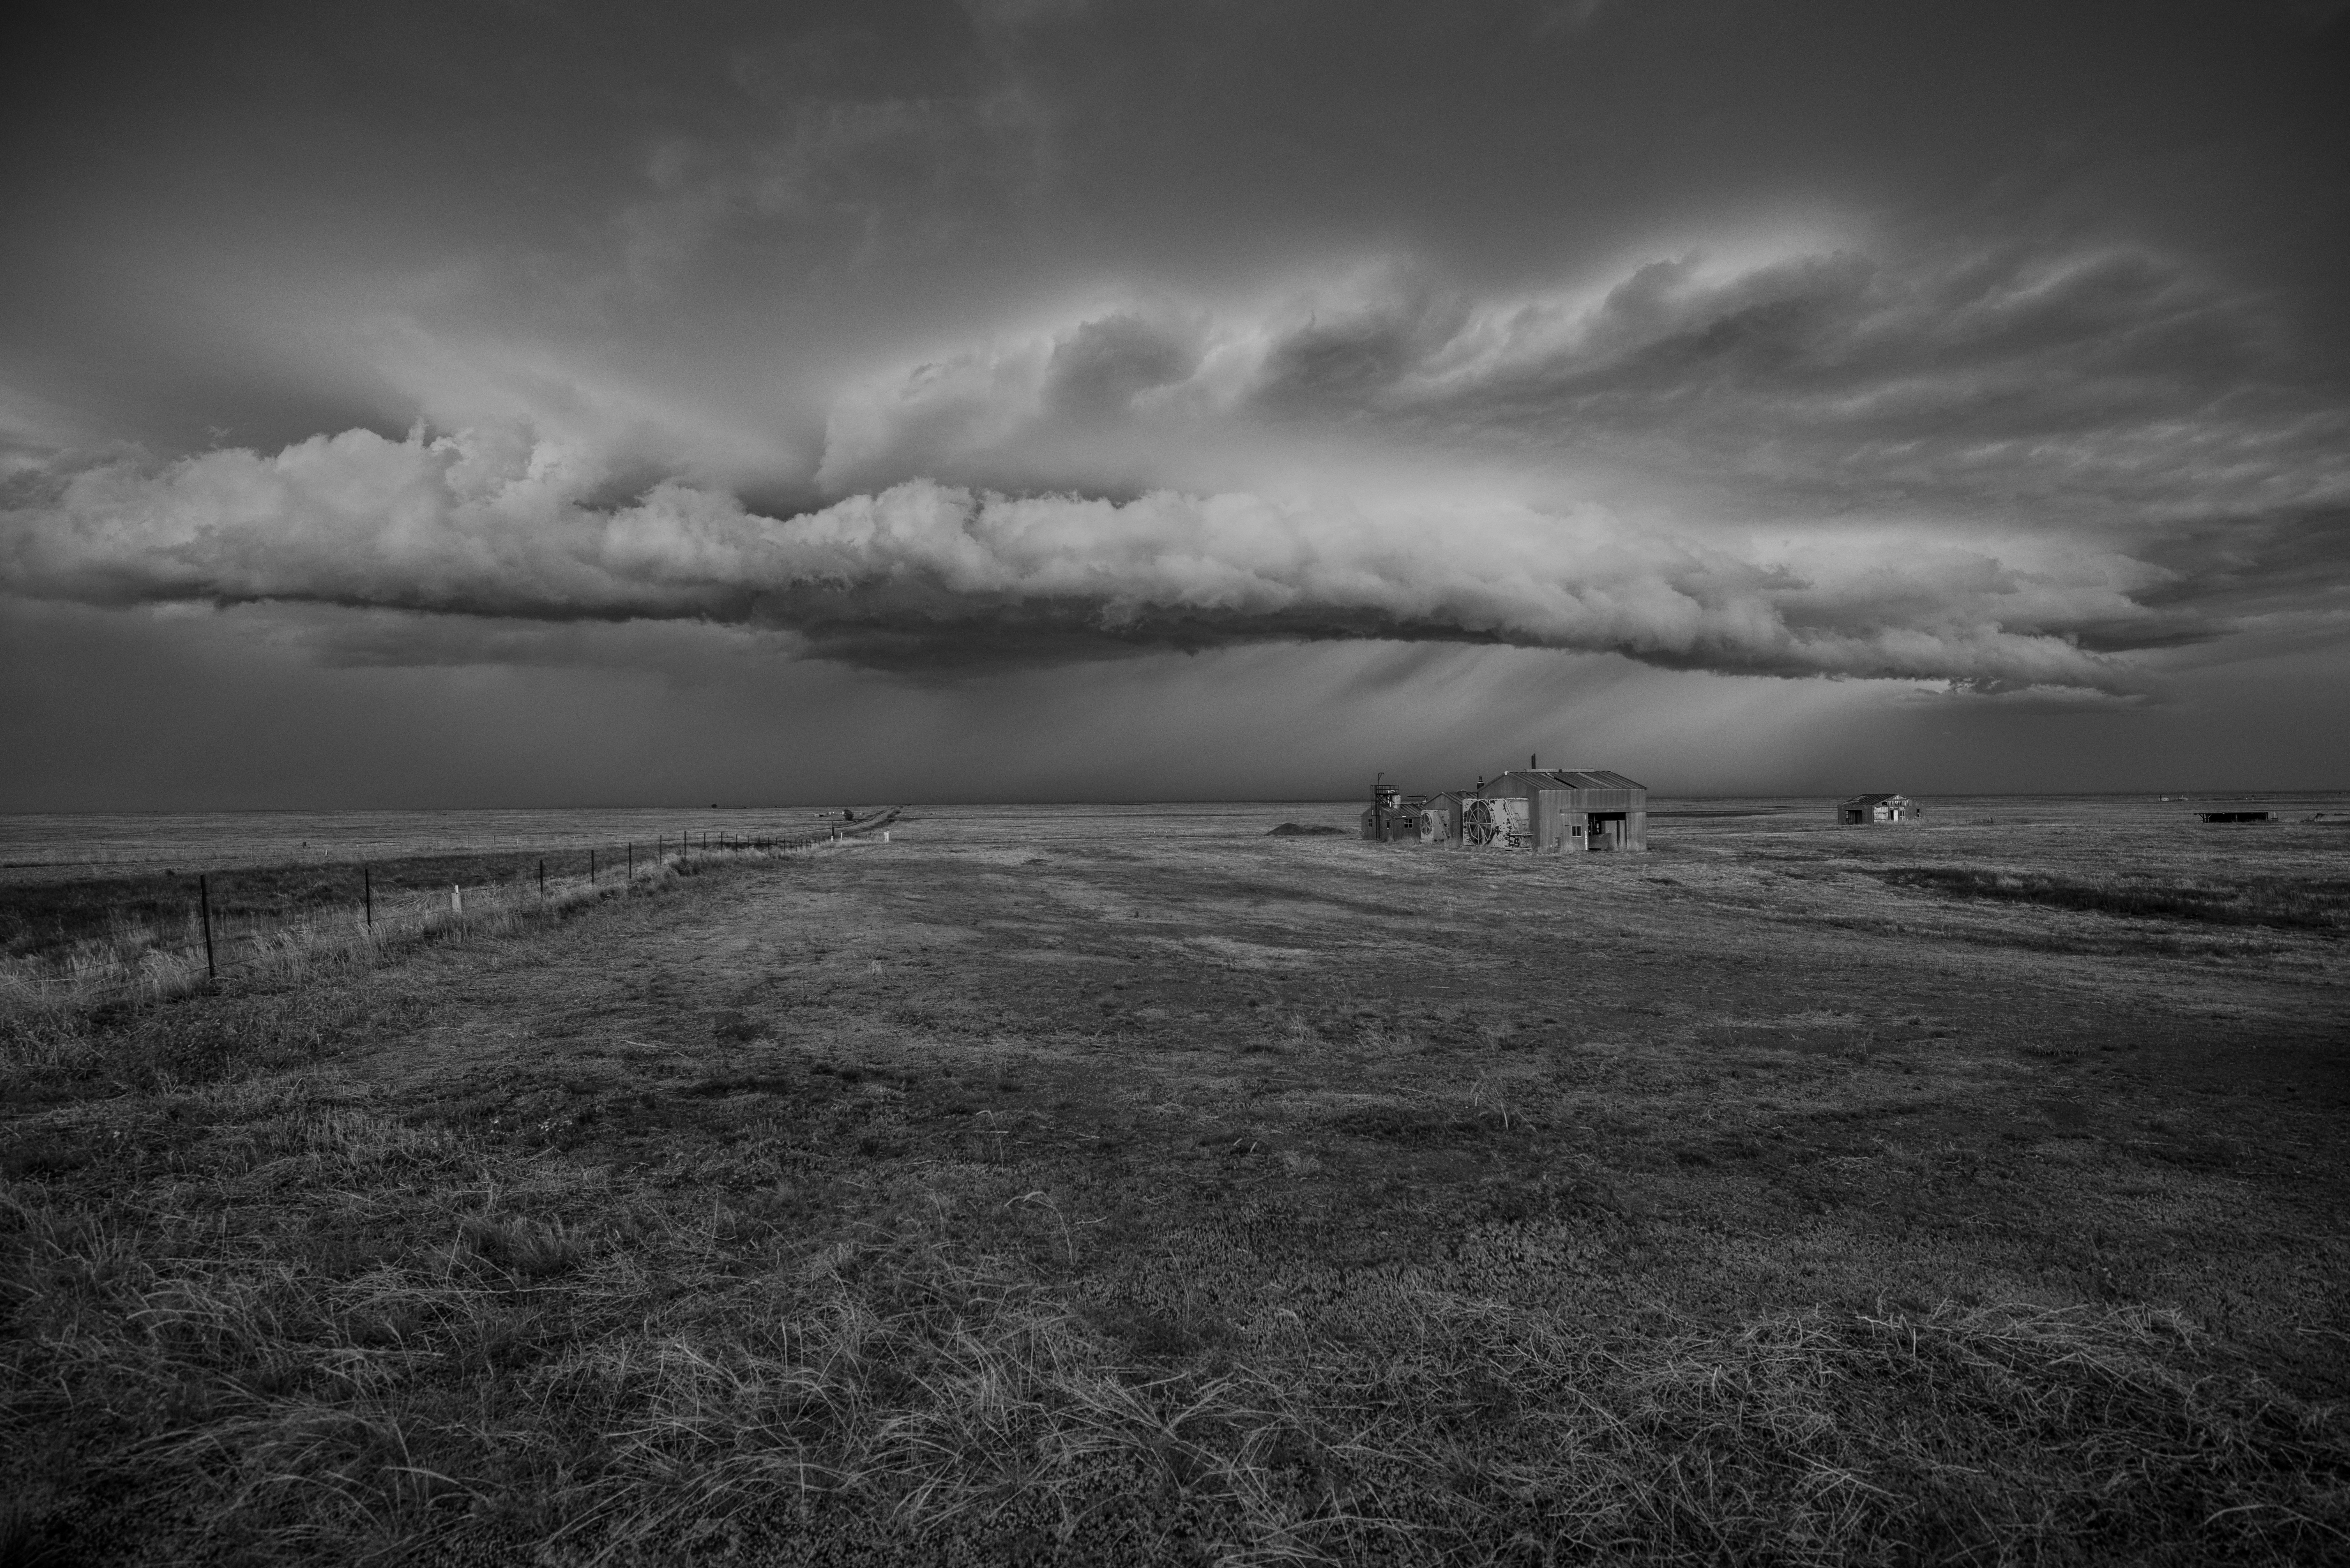 A storm in Alberta